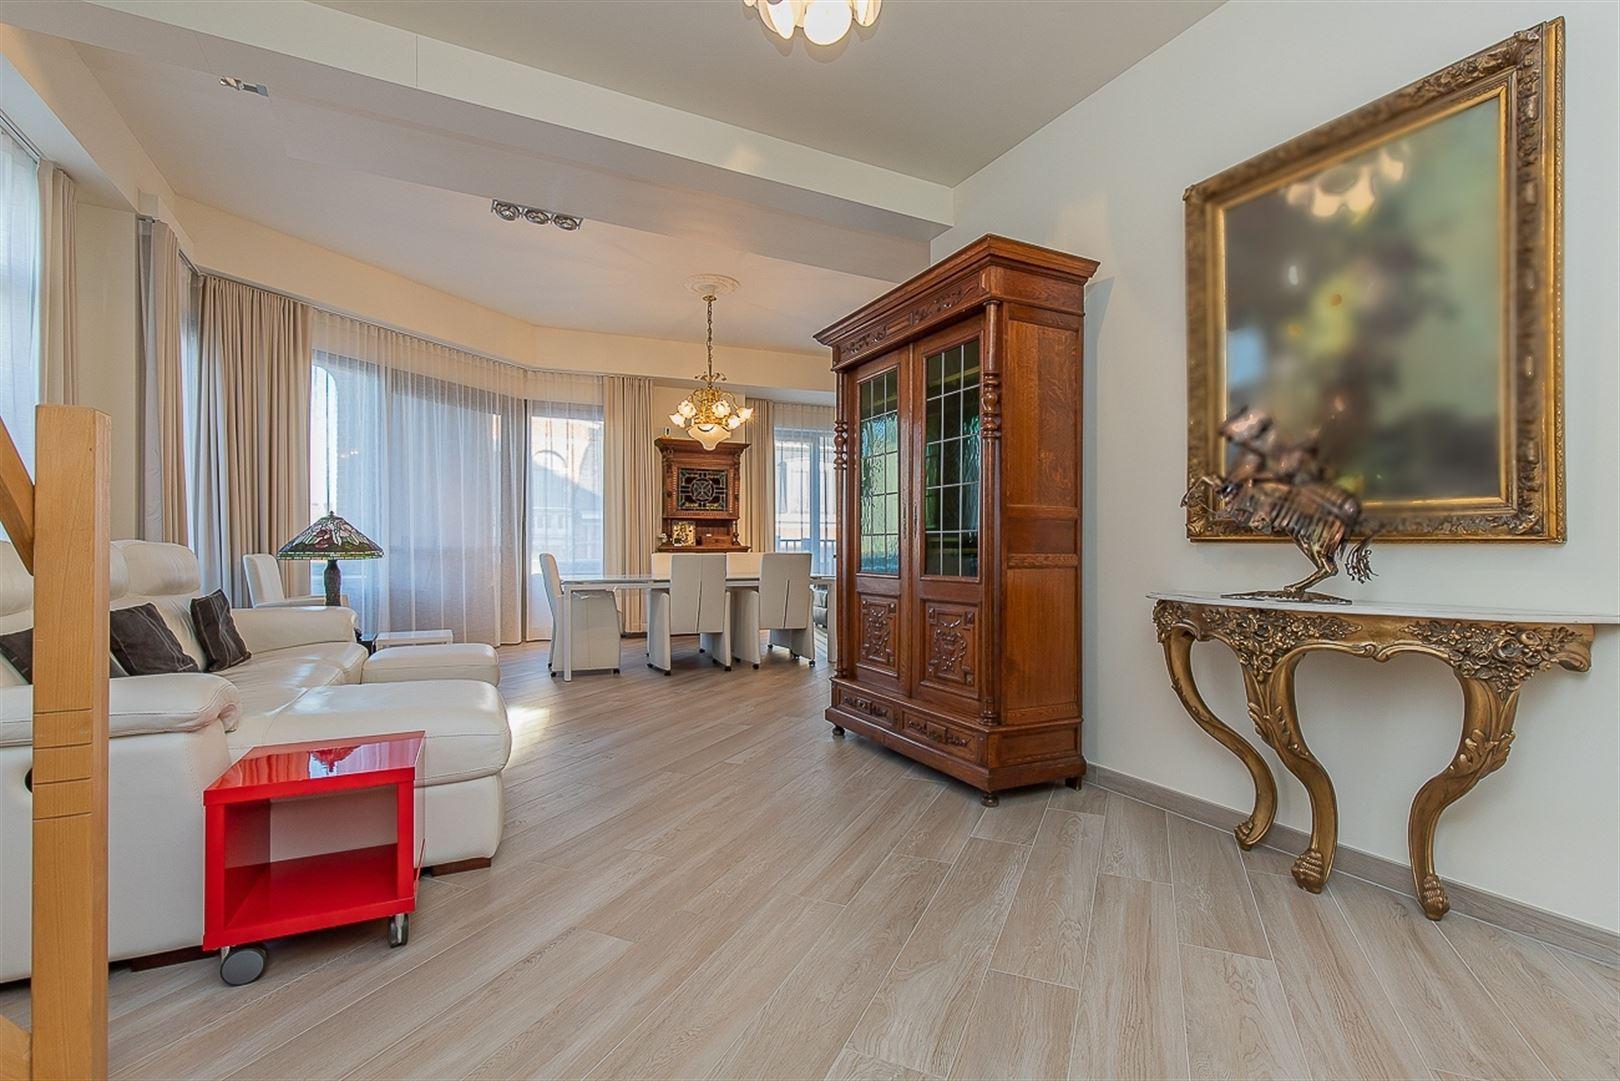 Foto 2 : Duplex/Penthouse te 9200 DENDERMONDE (België) - Prijs € 399.000